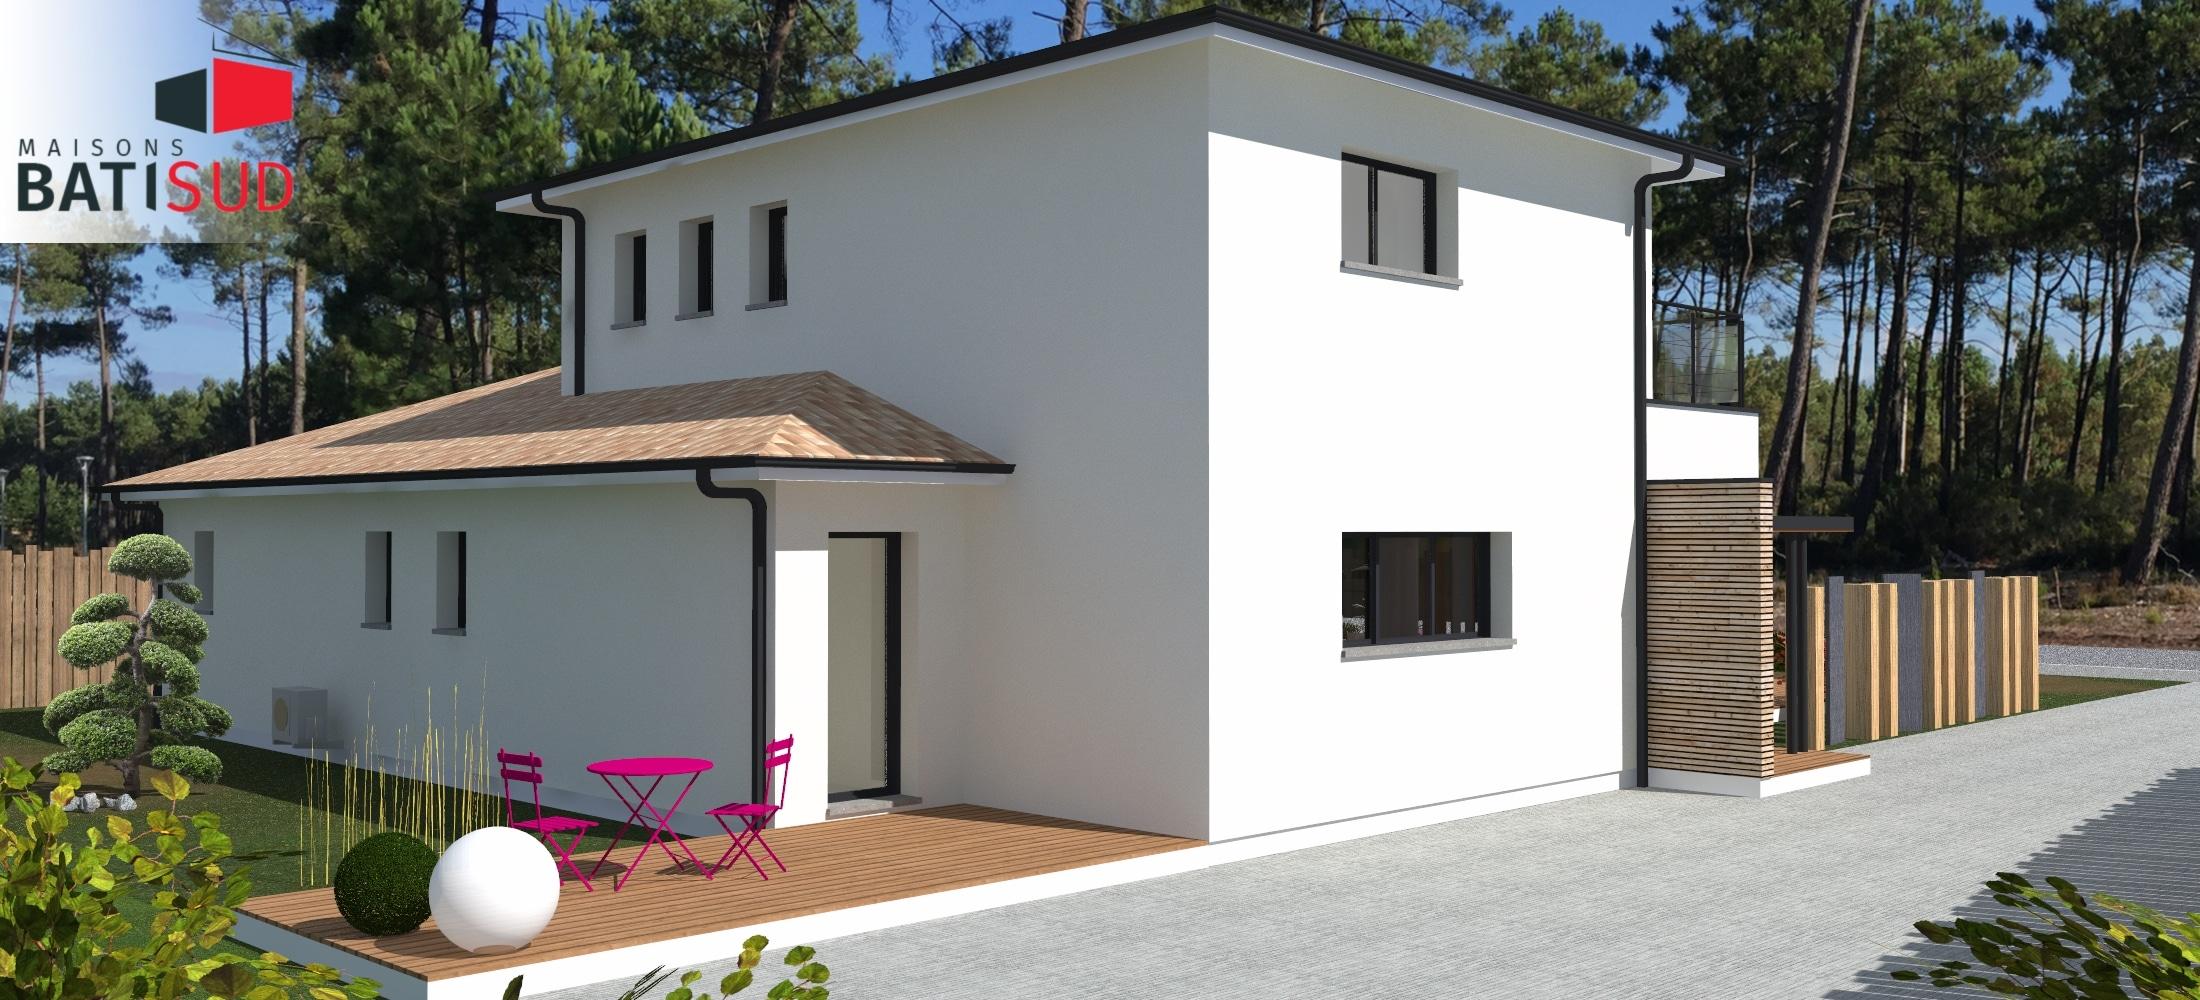 maisons bati sud construction andernos 2 maisons bati sud. Black Bedroom Furniture Sets. Home Design Ideas